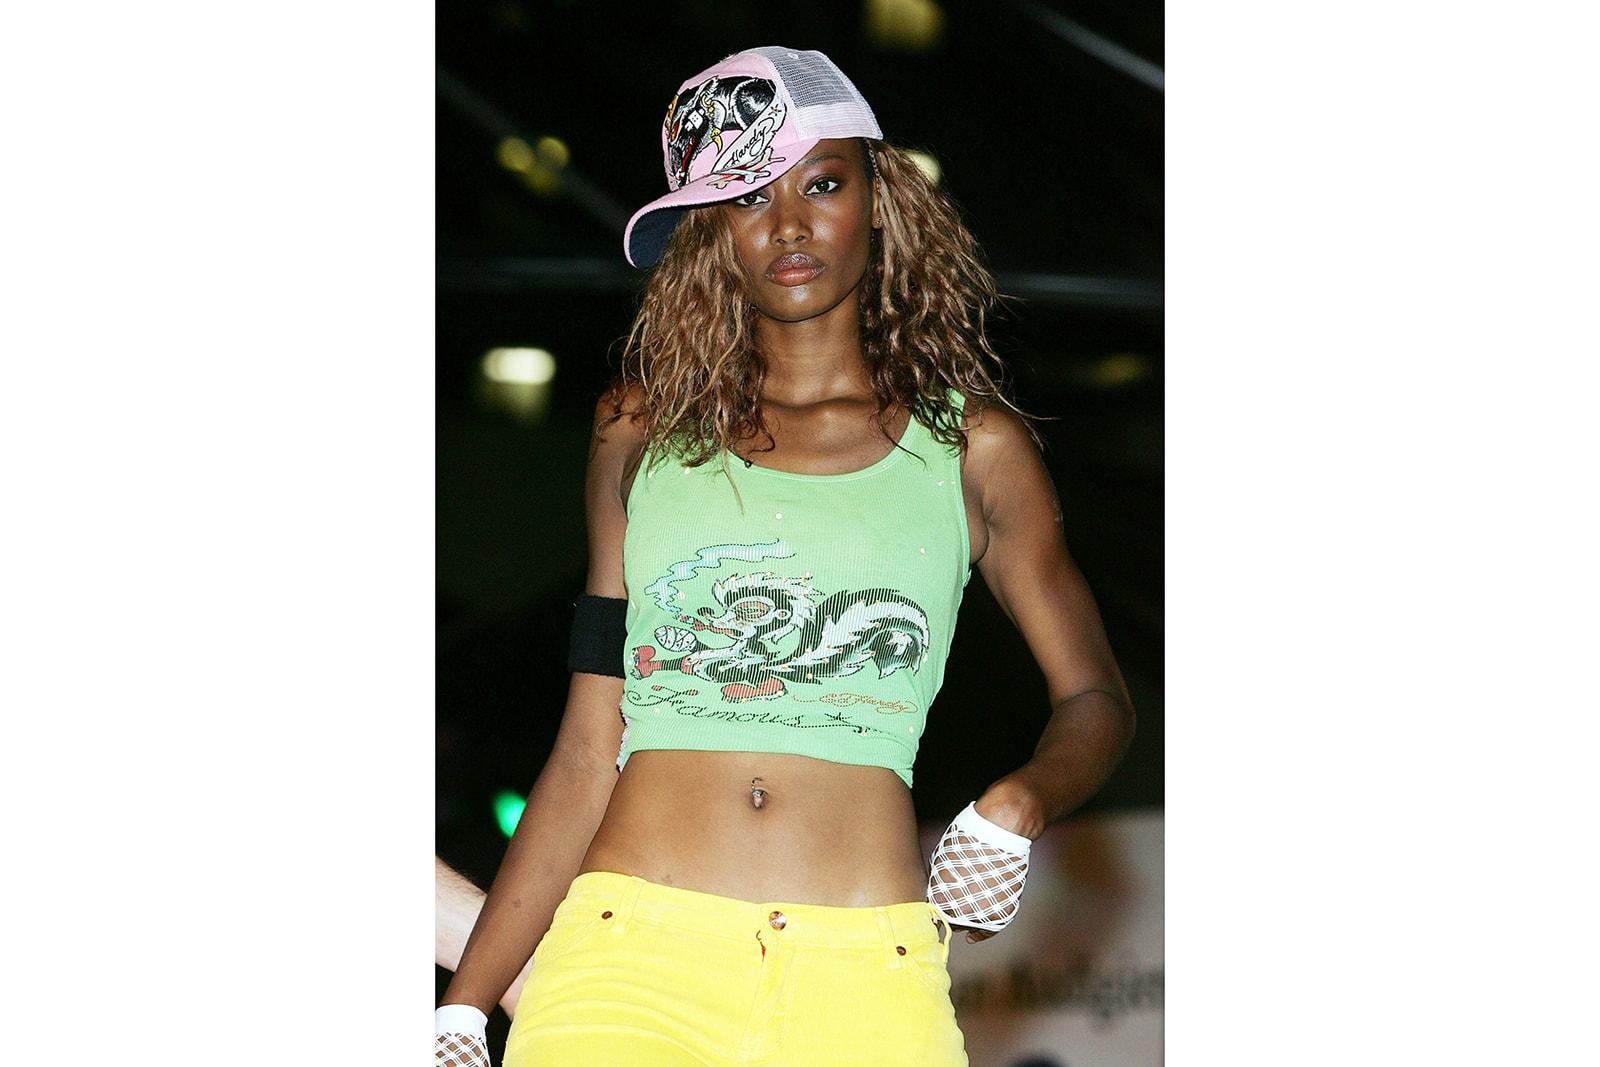 90s 00s fashion brands comeback nostalgia Baby Phat Ed Hardy L.A.M.B Rocawear FUBU Russell Athletics Karl Kani